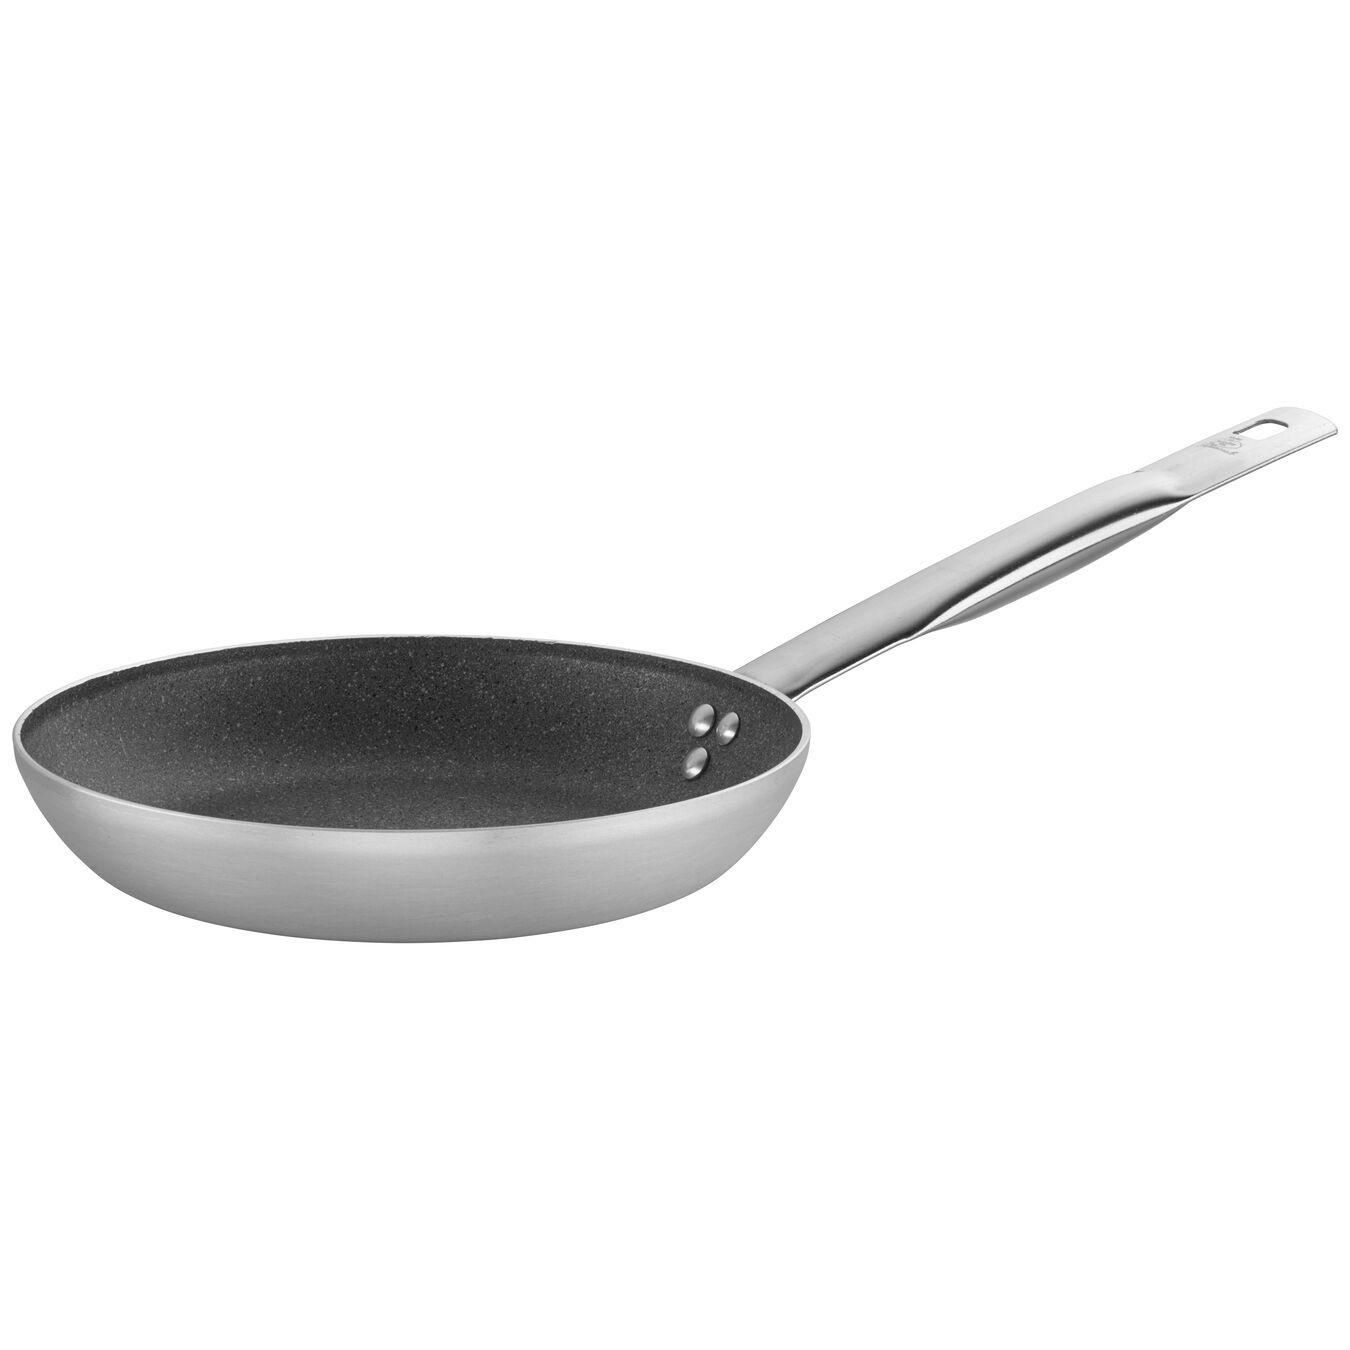 24 cm / 9.5 inch Aluminum Frying pan,,large 1